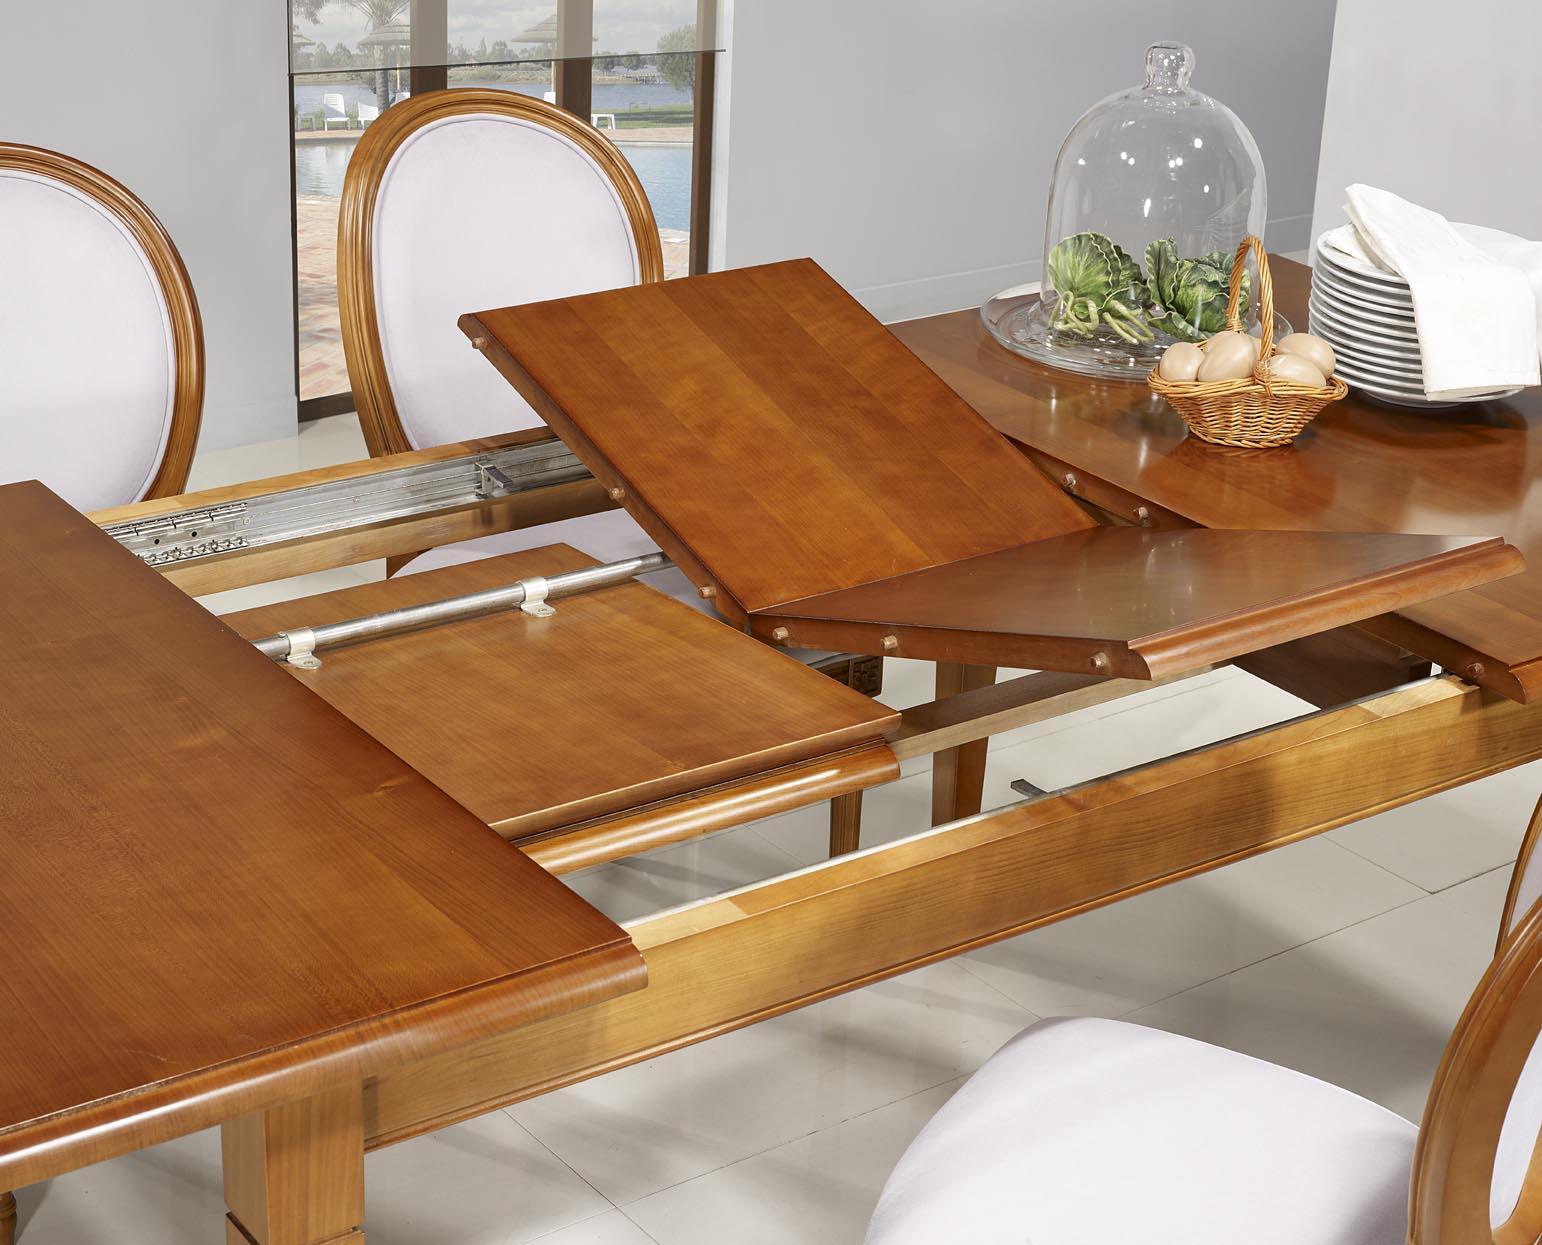 table de repas emeline ralise en merisier massif de style louis philippe 140x100 - Table Merisier Massif